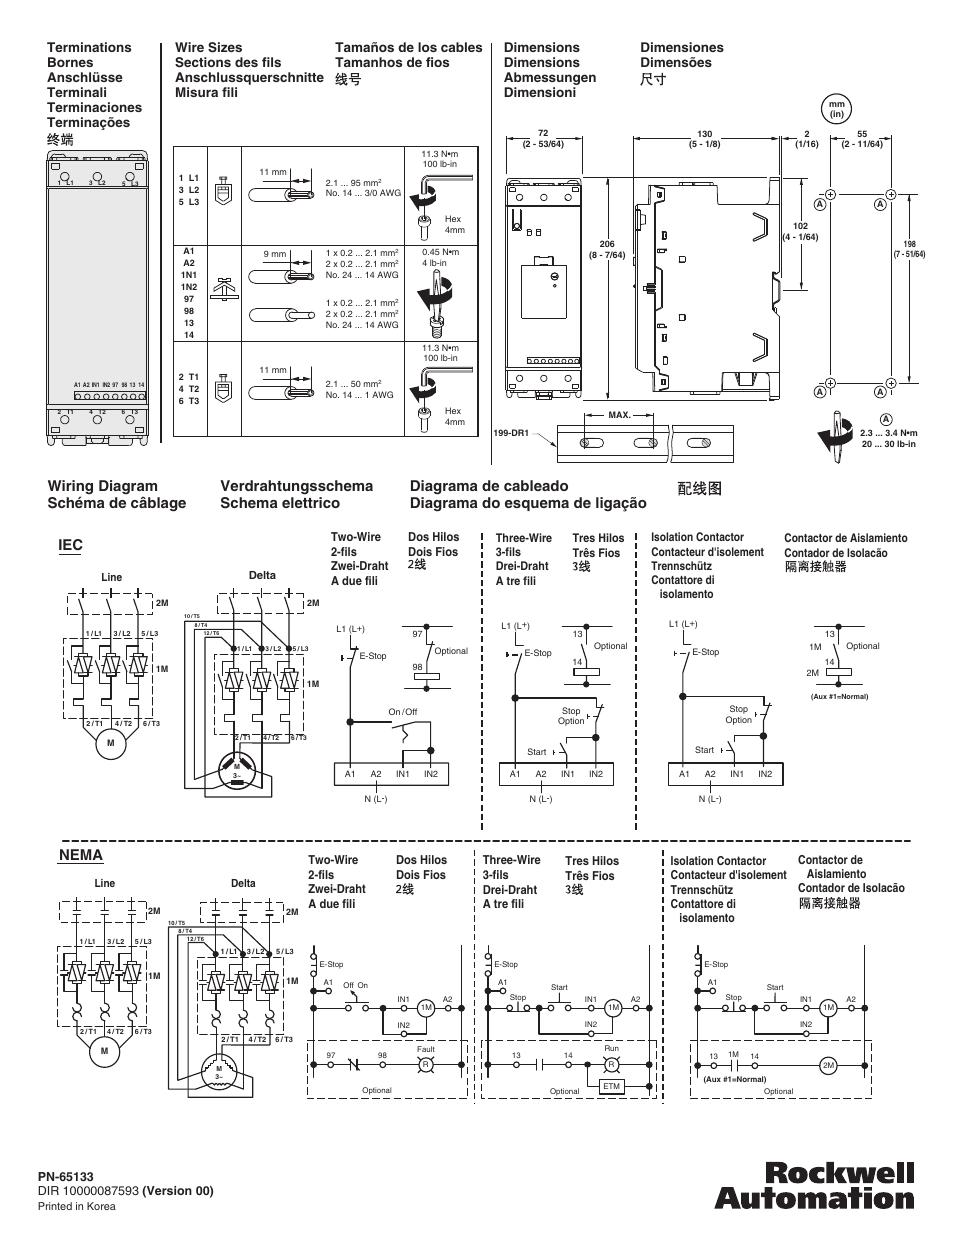 smc manifold wiring diagram